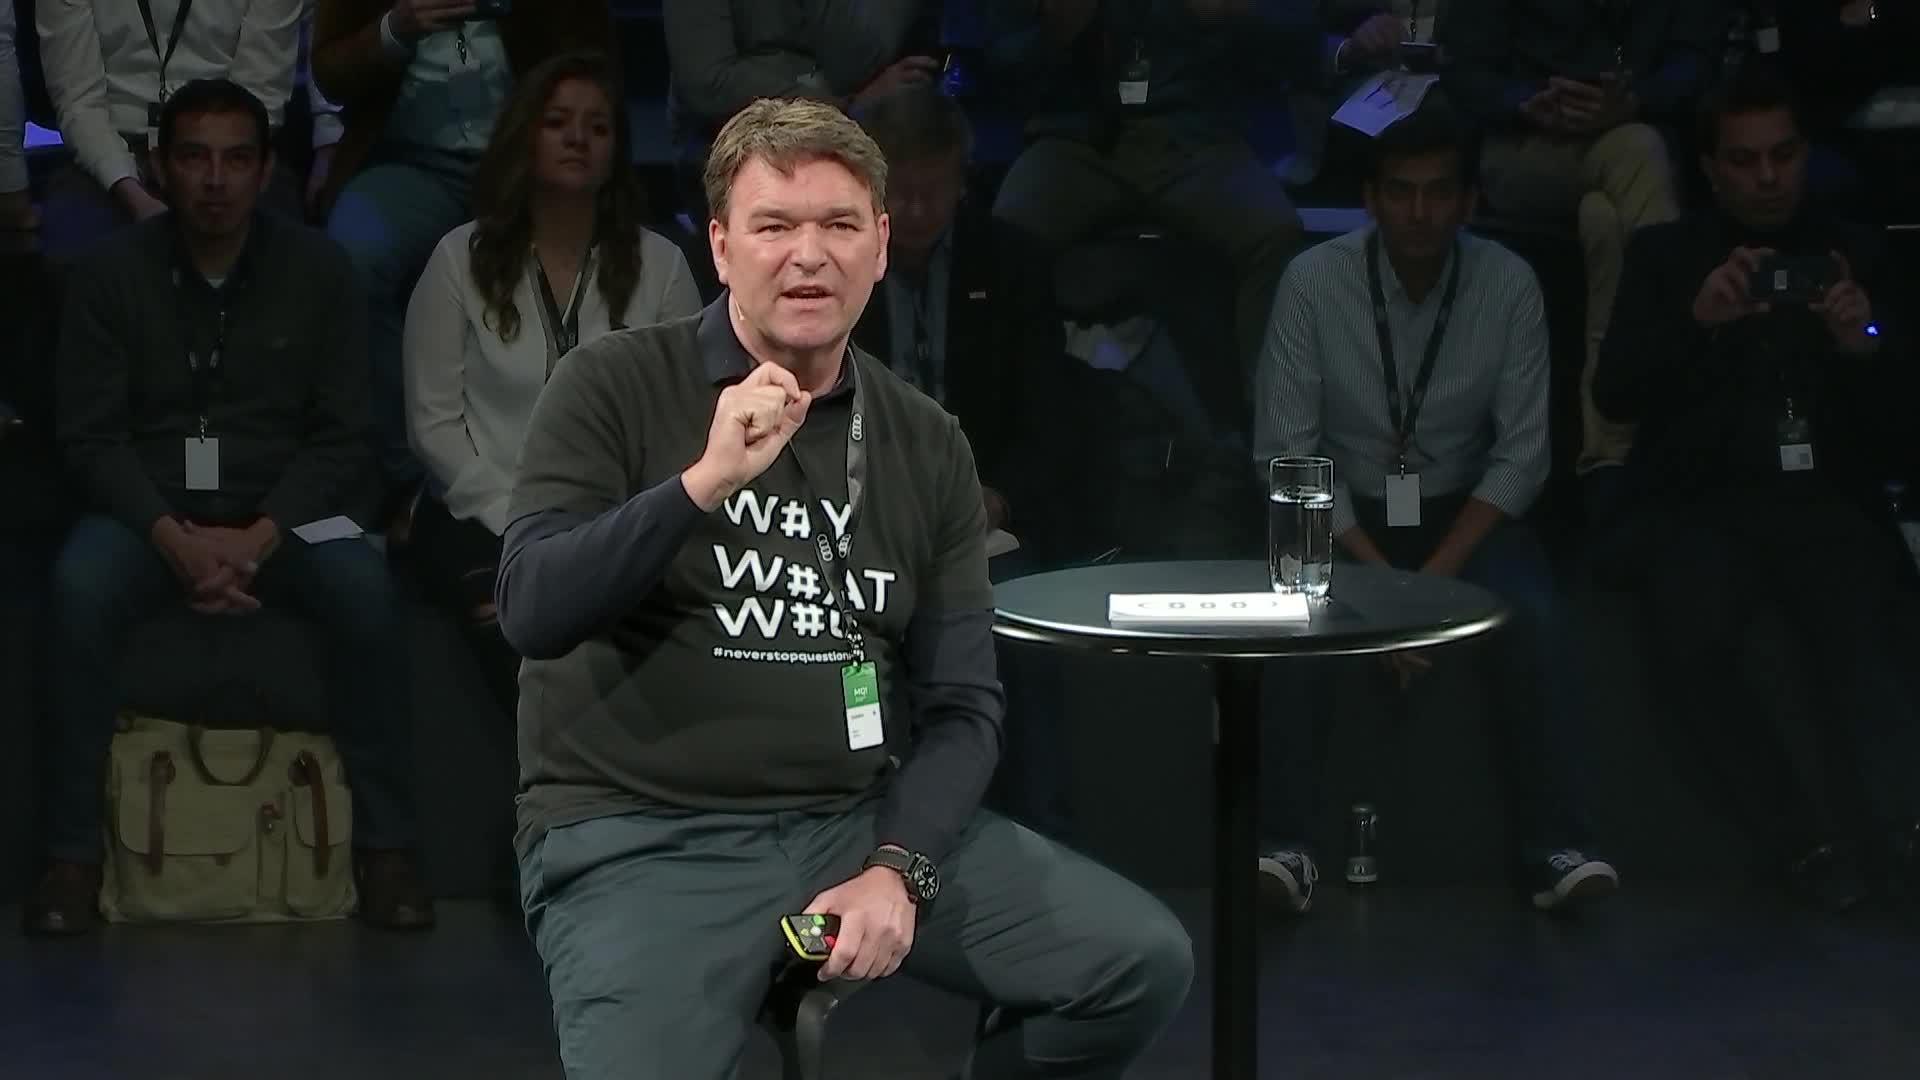 Time to reflect: Bram Schot talks future at the Audi MQ! Innovation Summit